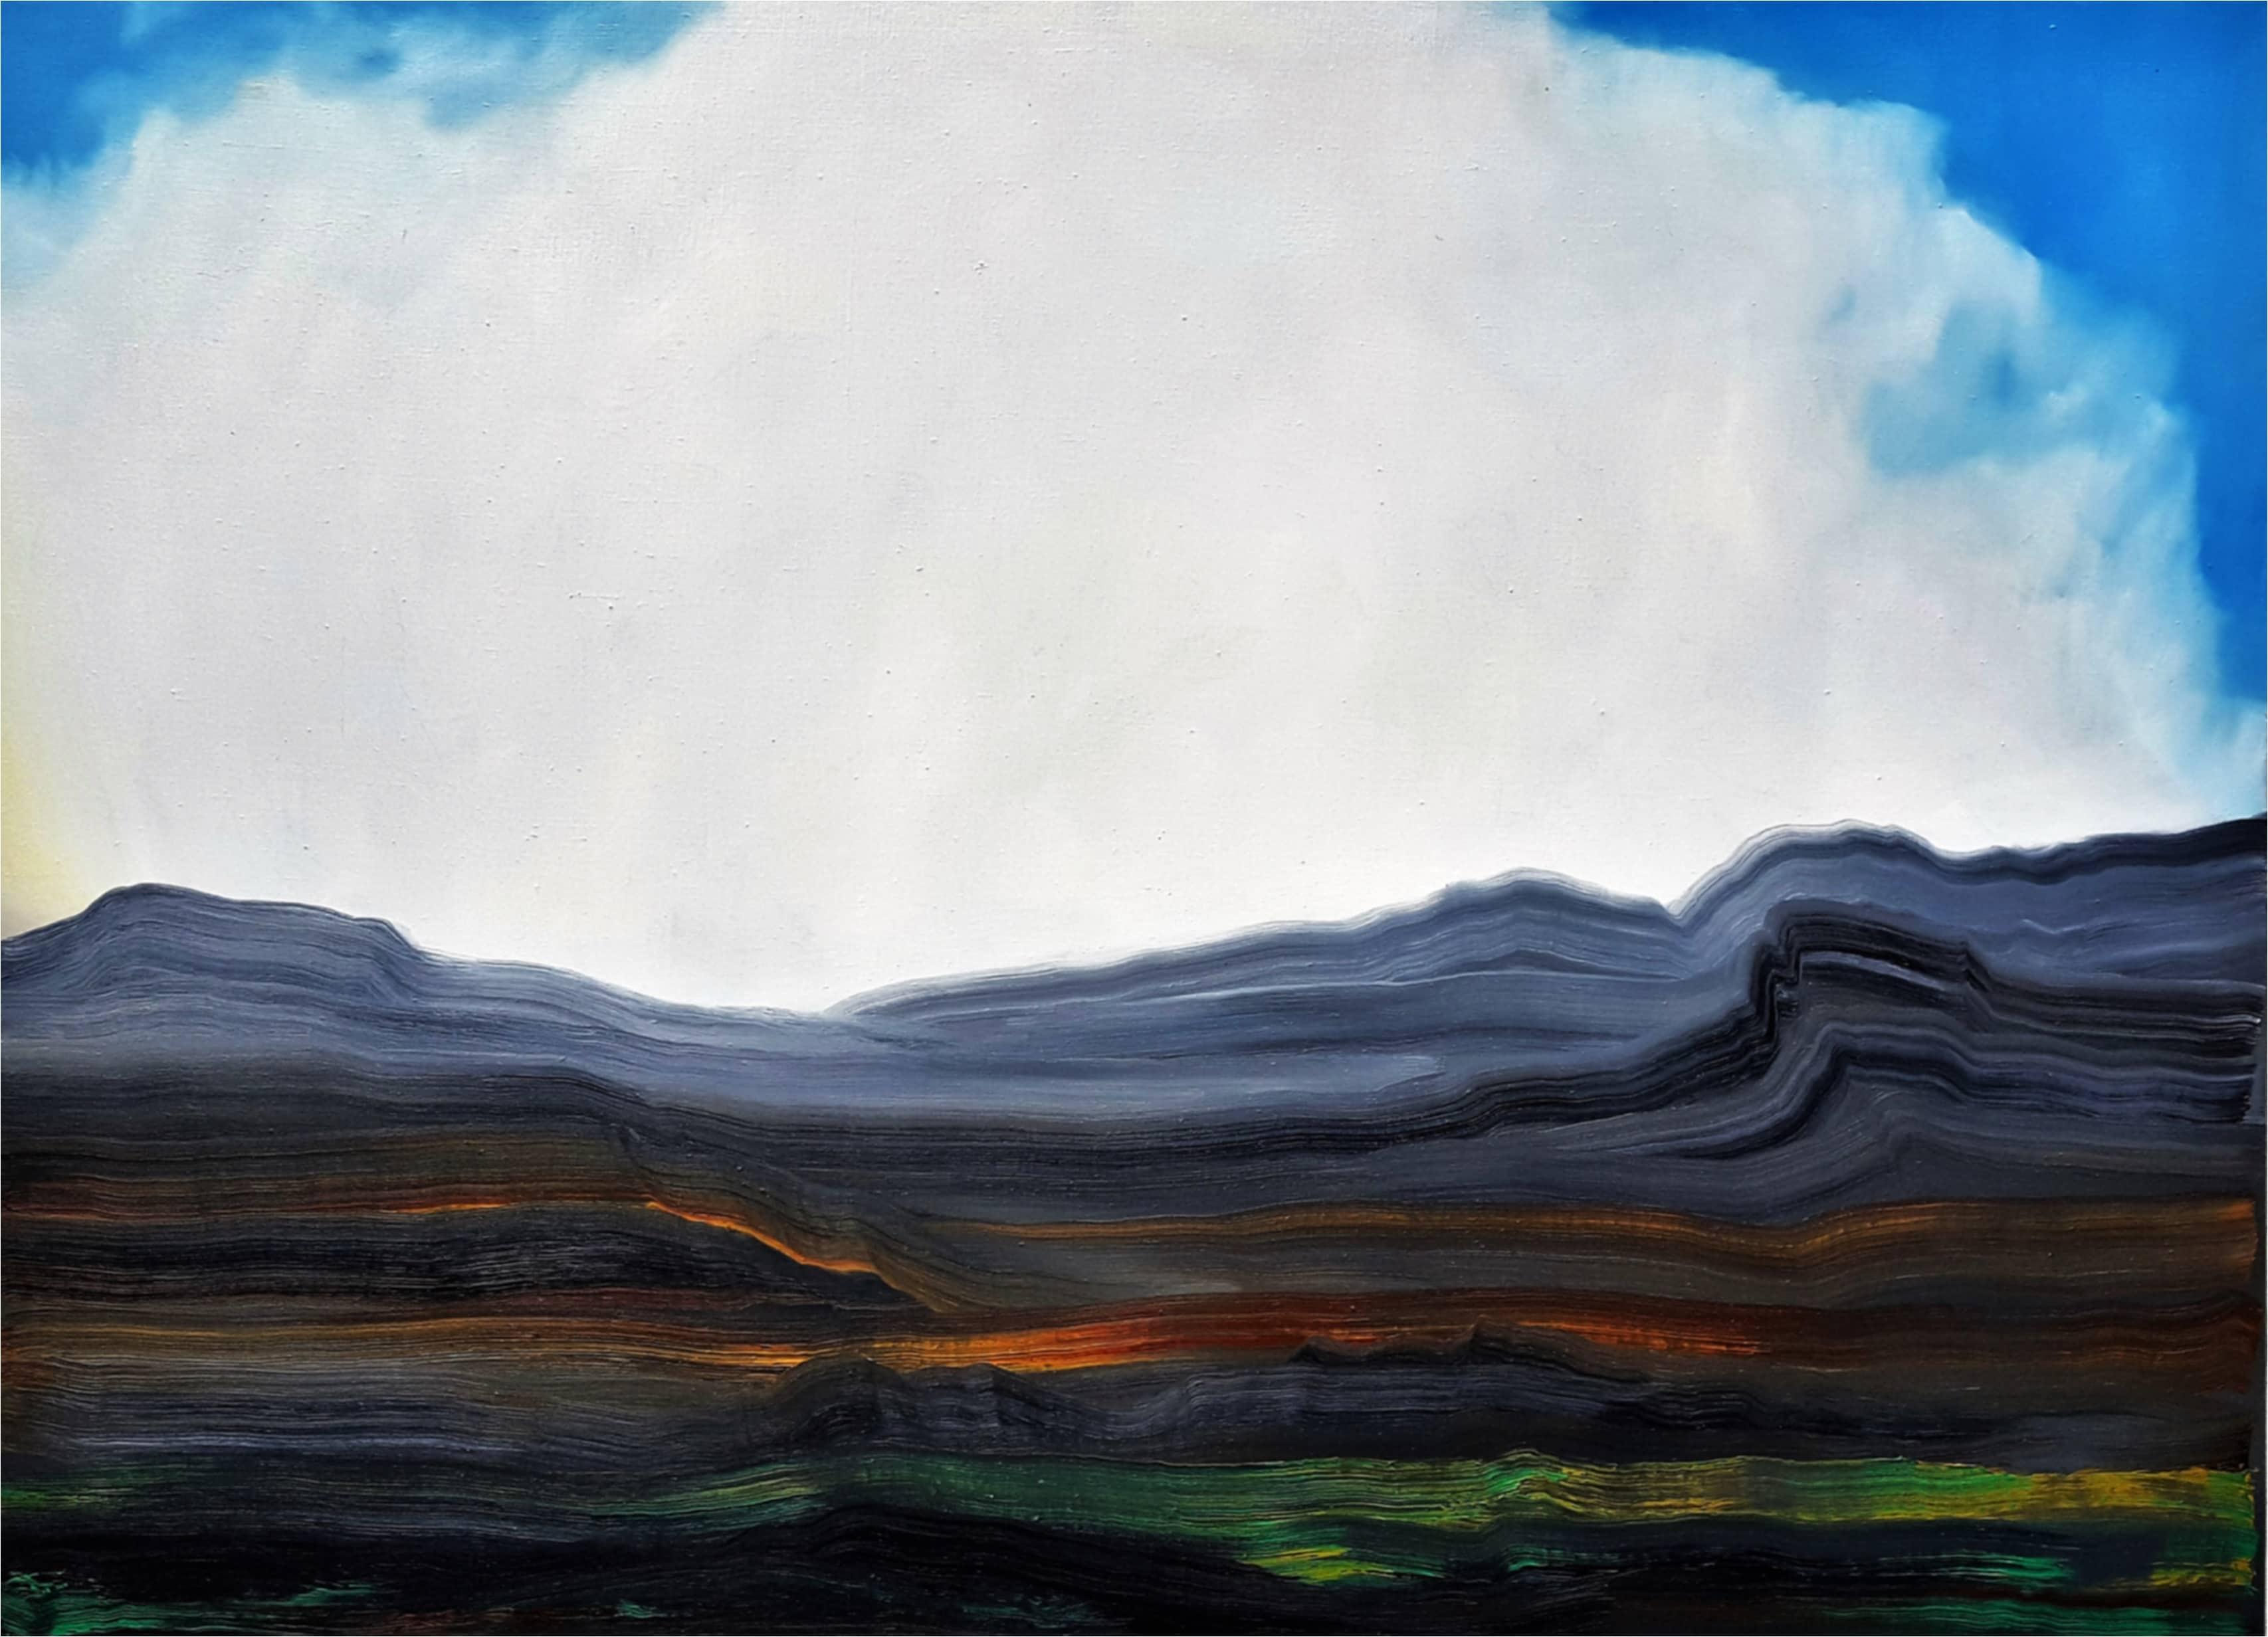 325-1 - Abstrakte Berglandschaft